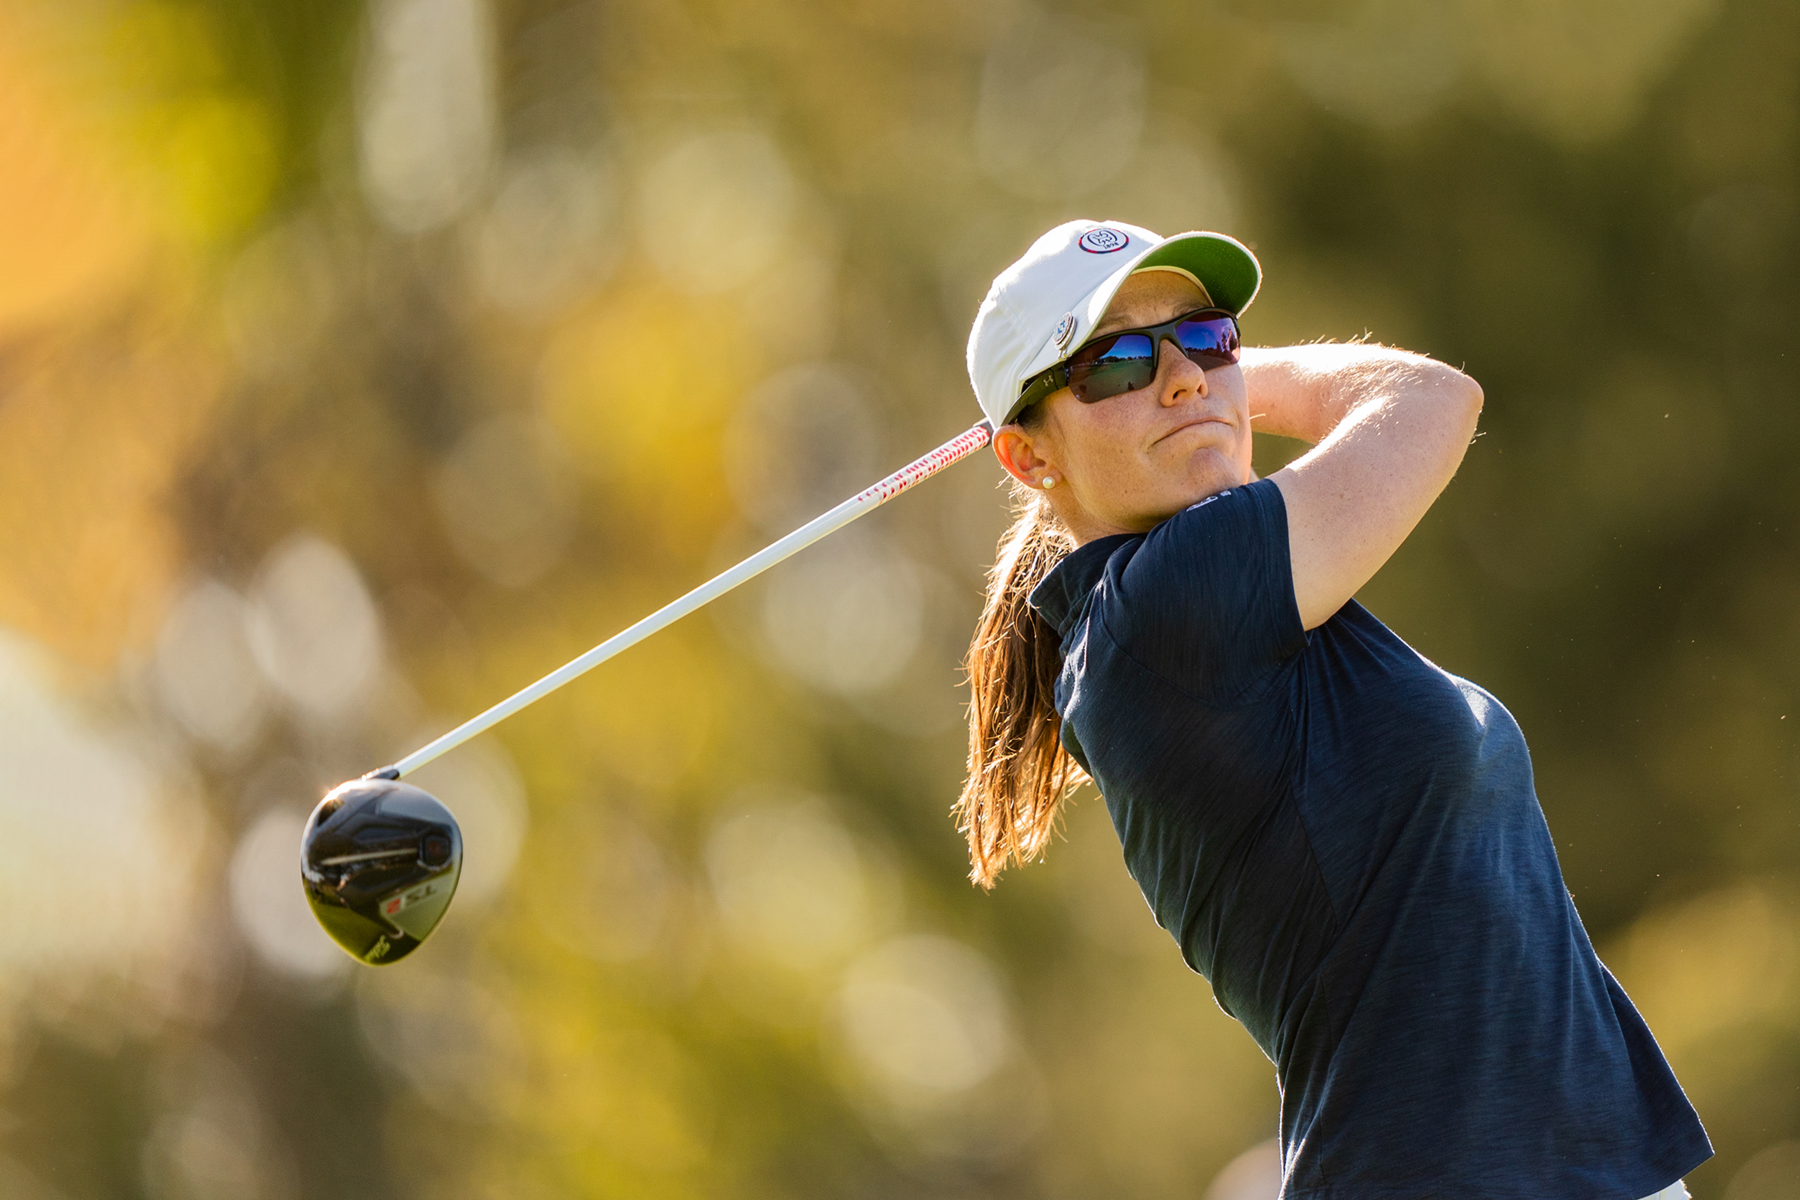 Joanna Coe, PGA